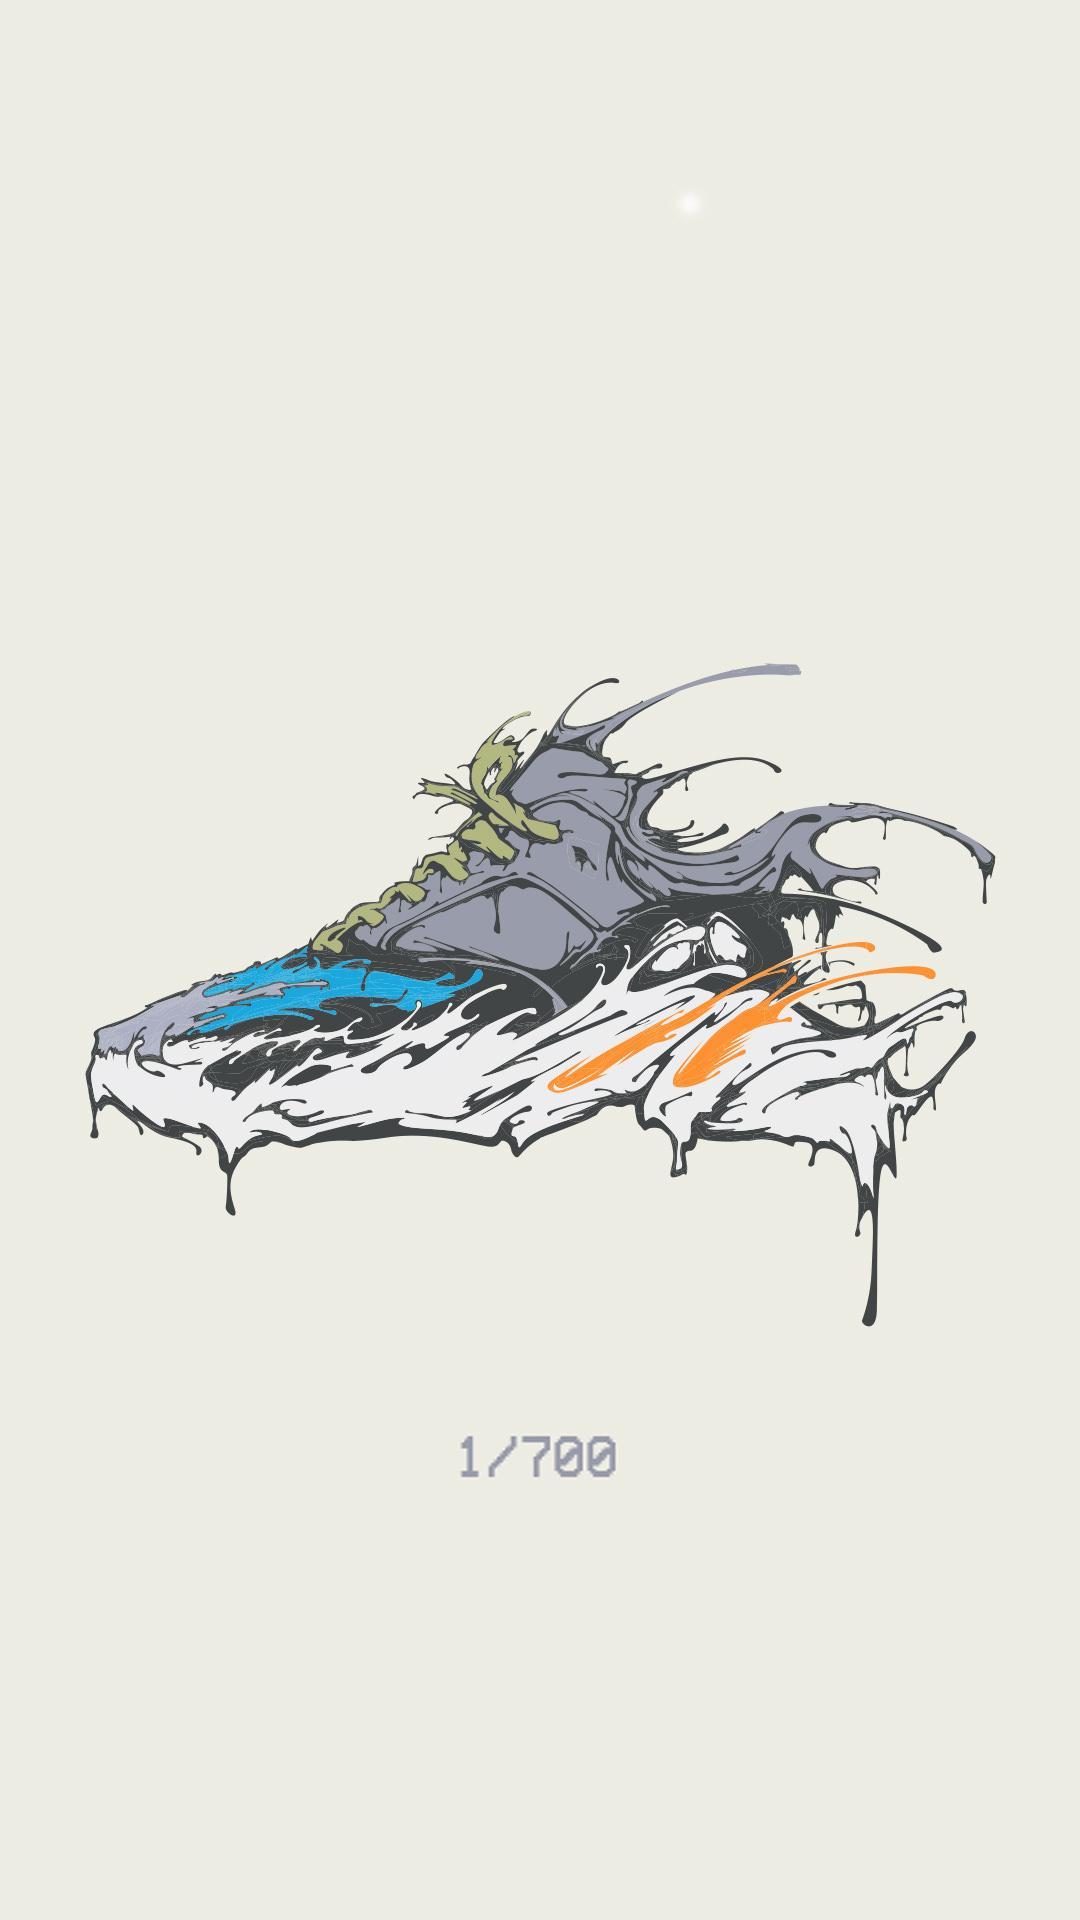 Yeezy 700 Waverunner wallpaper - Album on Imgur